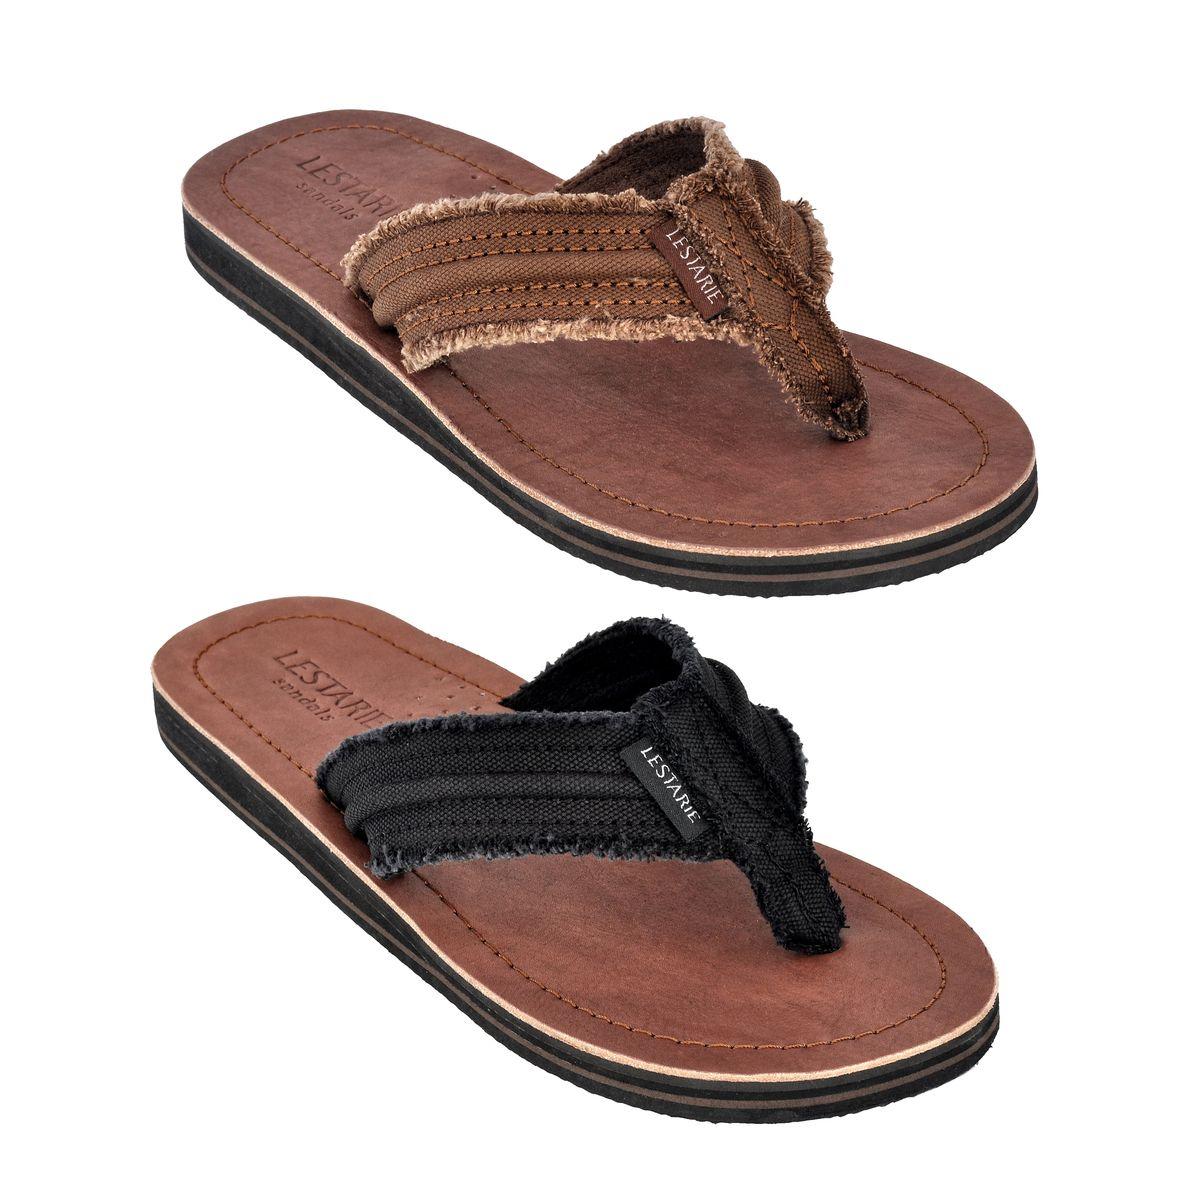 2708f5919d87e0 Das Bild wird geladen LESTARIE-Herren-Sandale-Zehentrenner-Leder-Flip-Flop- Sandalen-